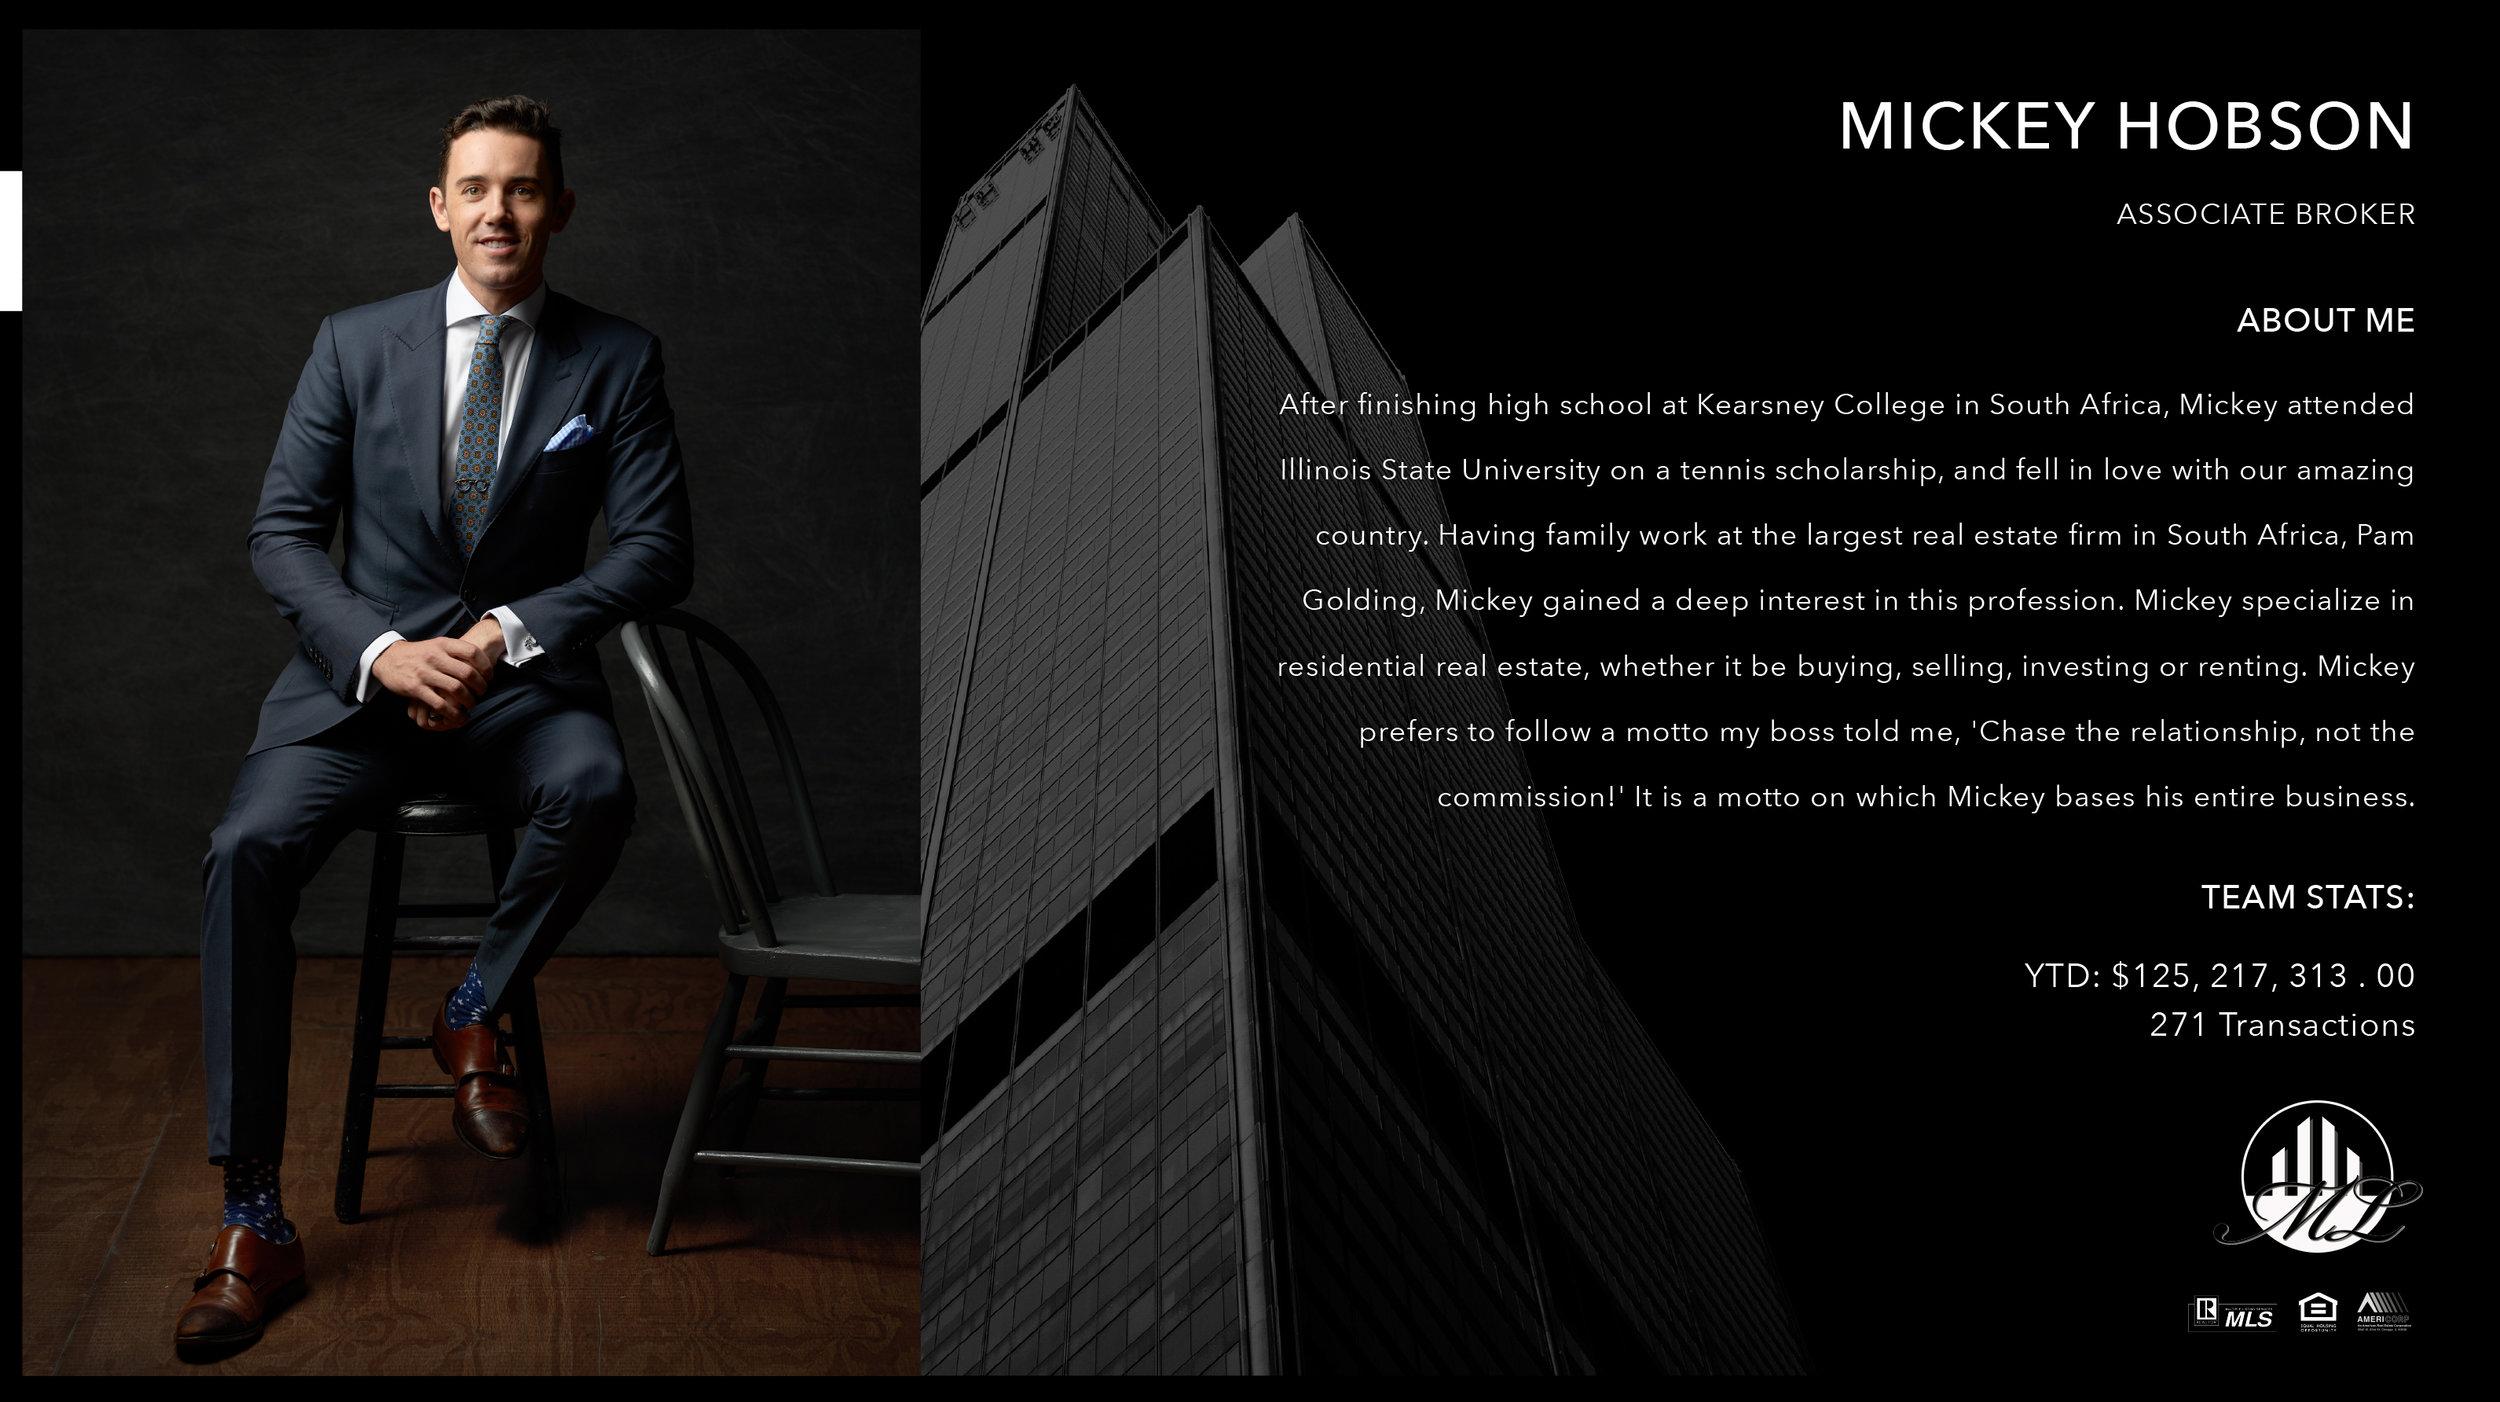 Mickey Hobson AM.jpg